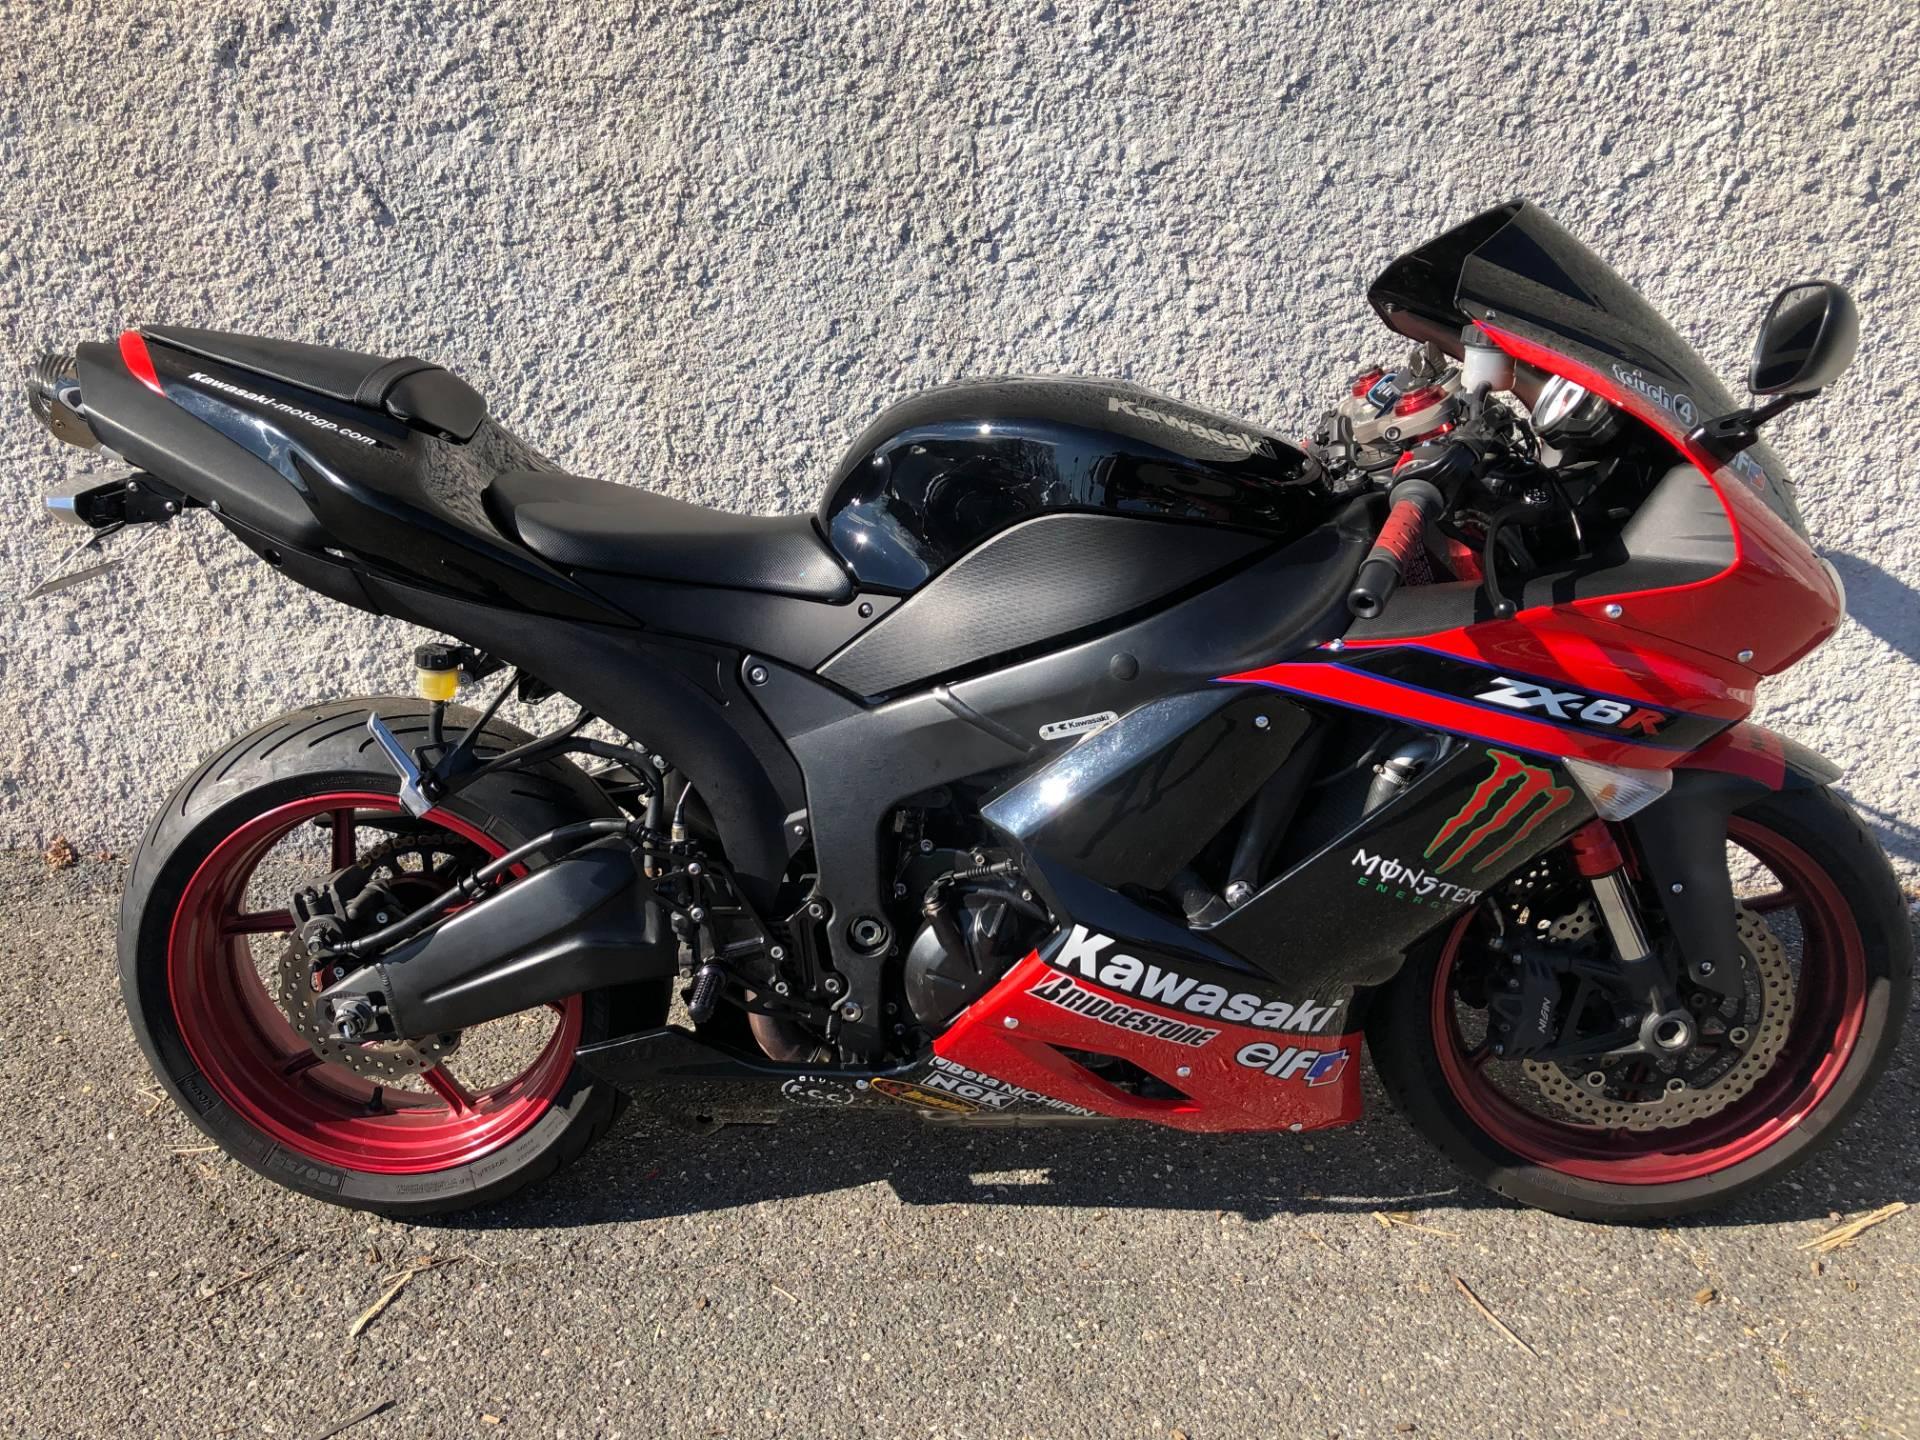 Used 2007 Kawasaki Ninja Zx 6r Motorcycles In Hicksville Ny